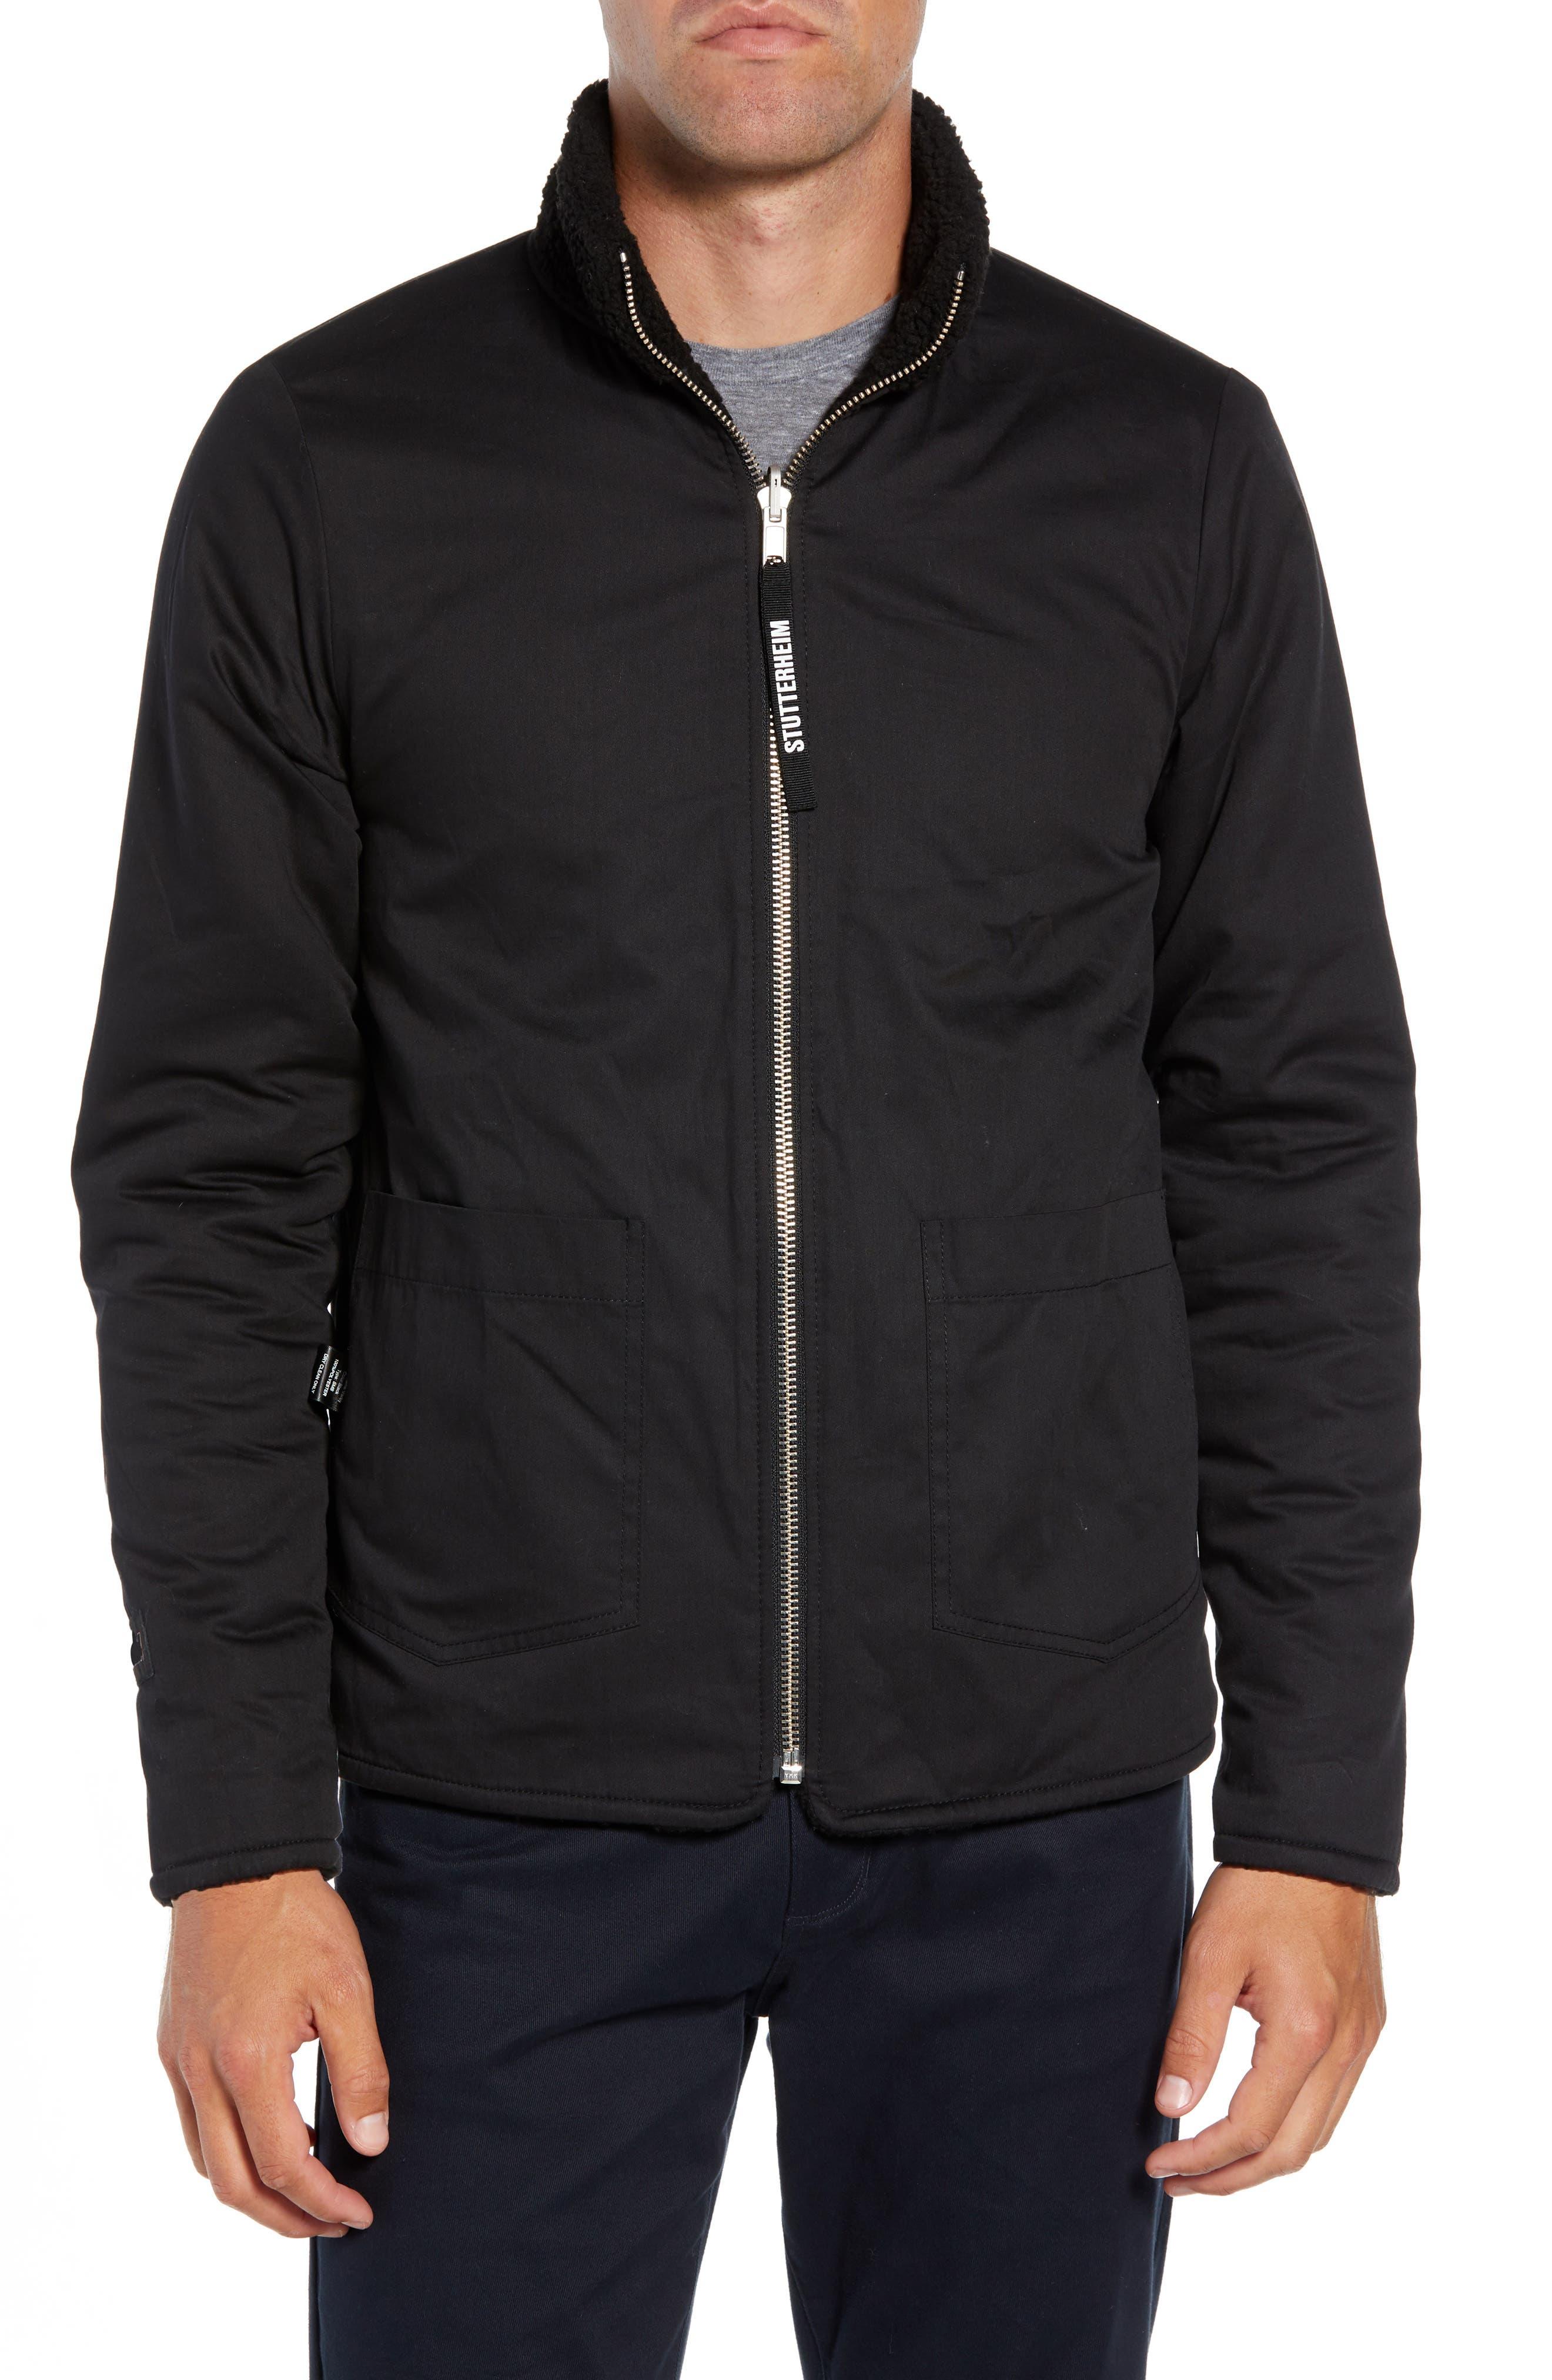 Varby Reversible Fleece Jacket,                             Alternate thumbnail 2, color,                             BLACK